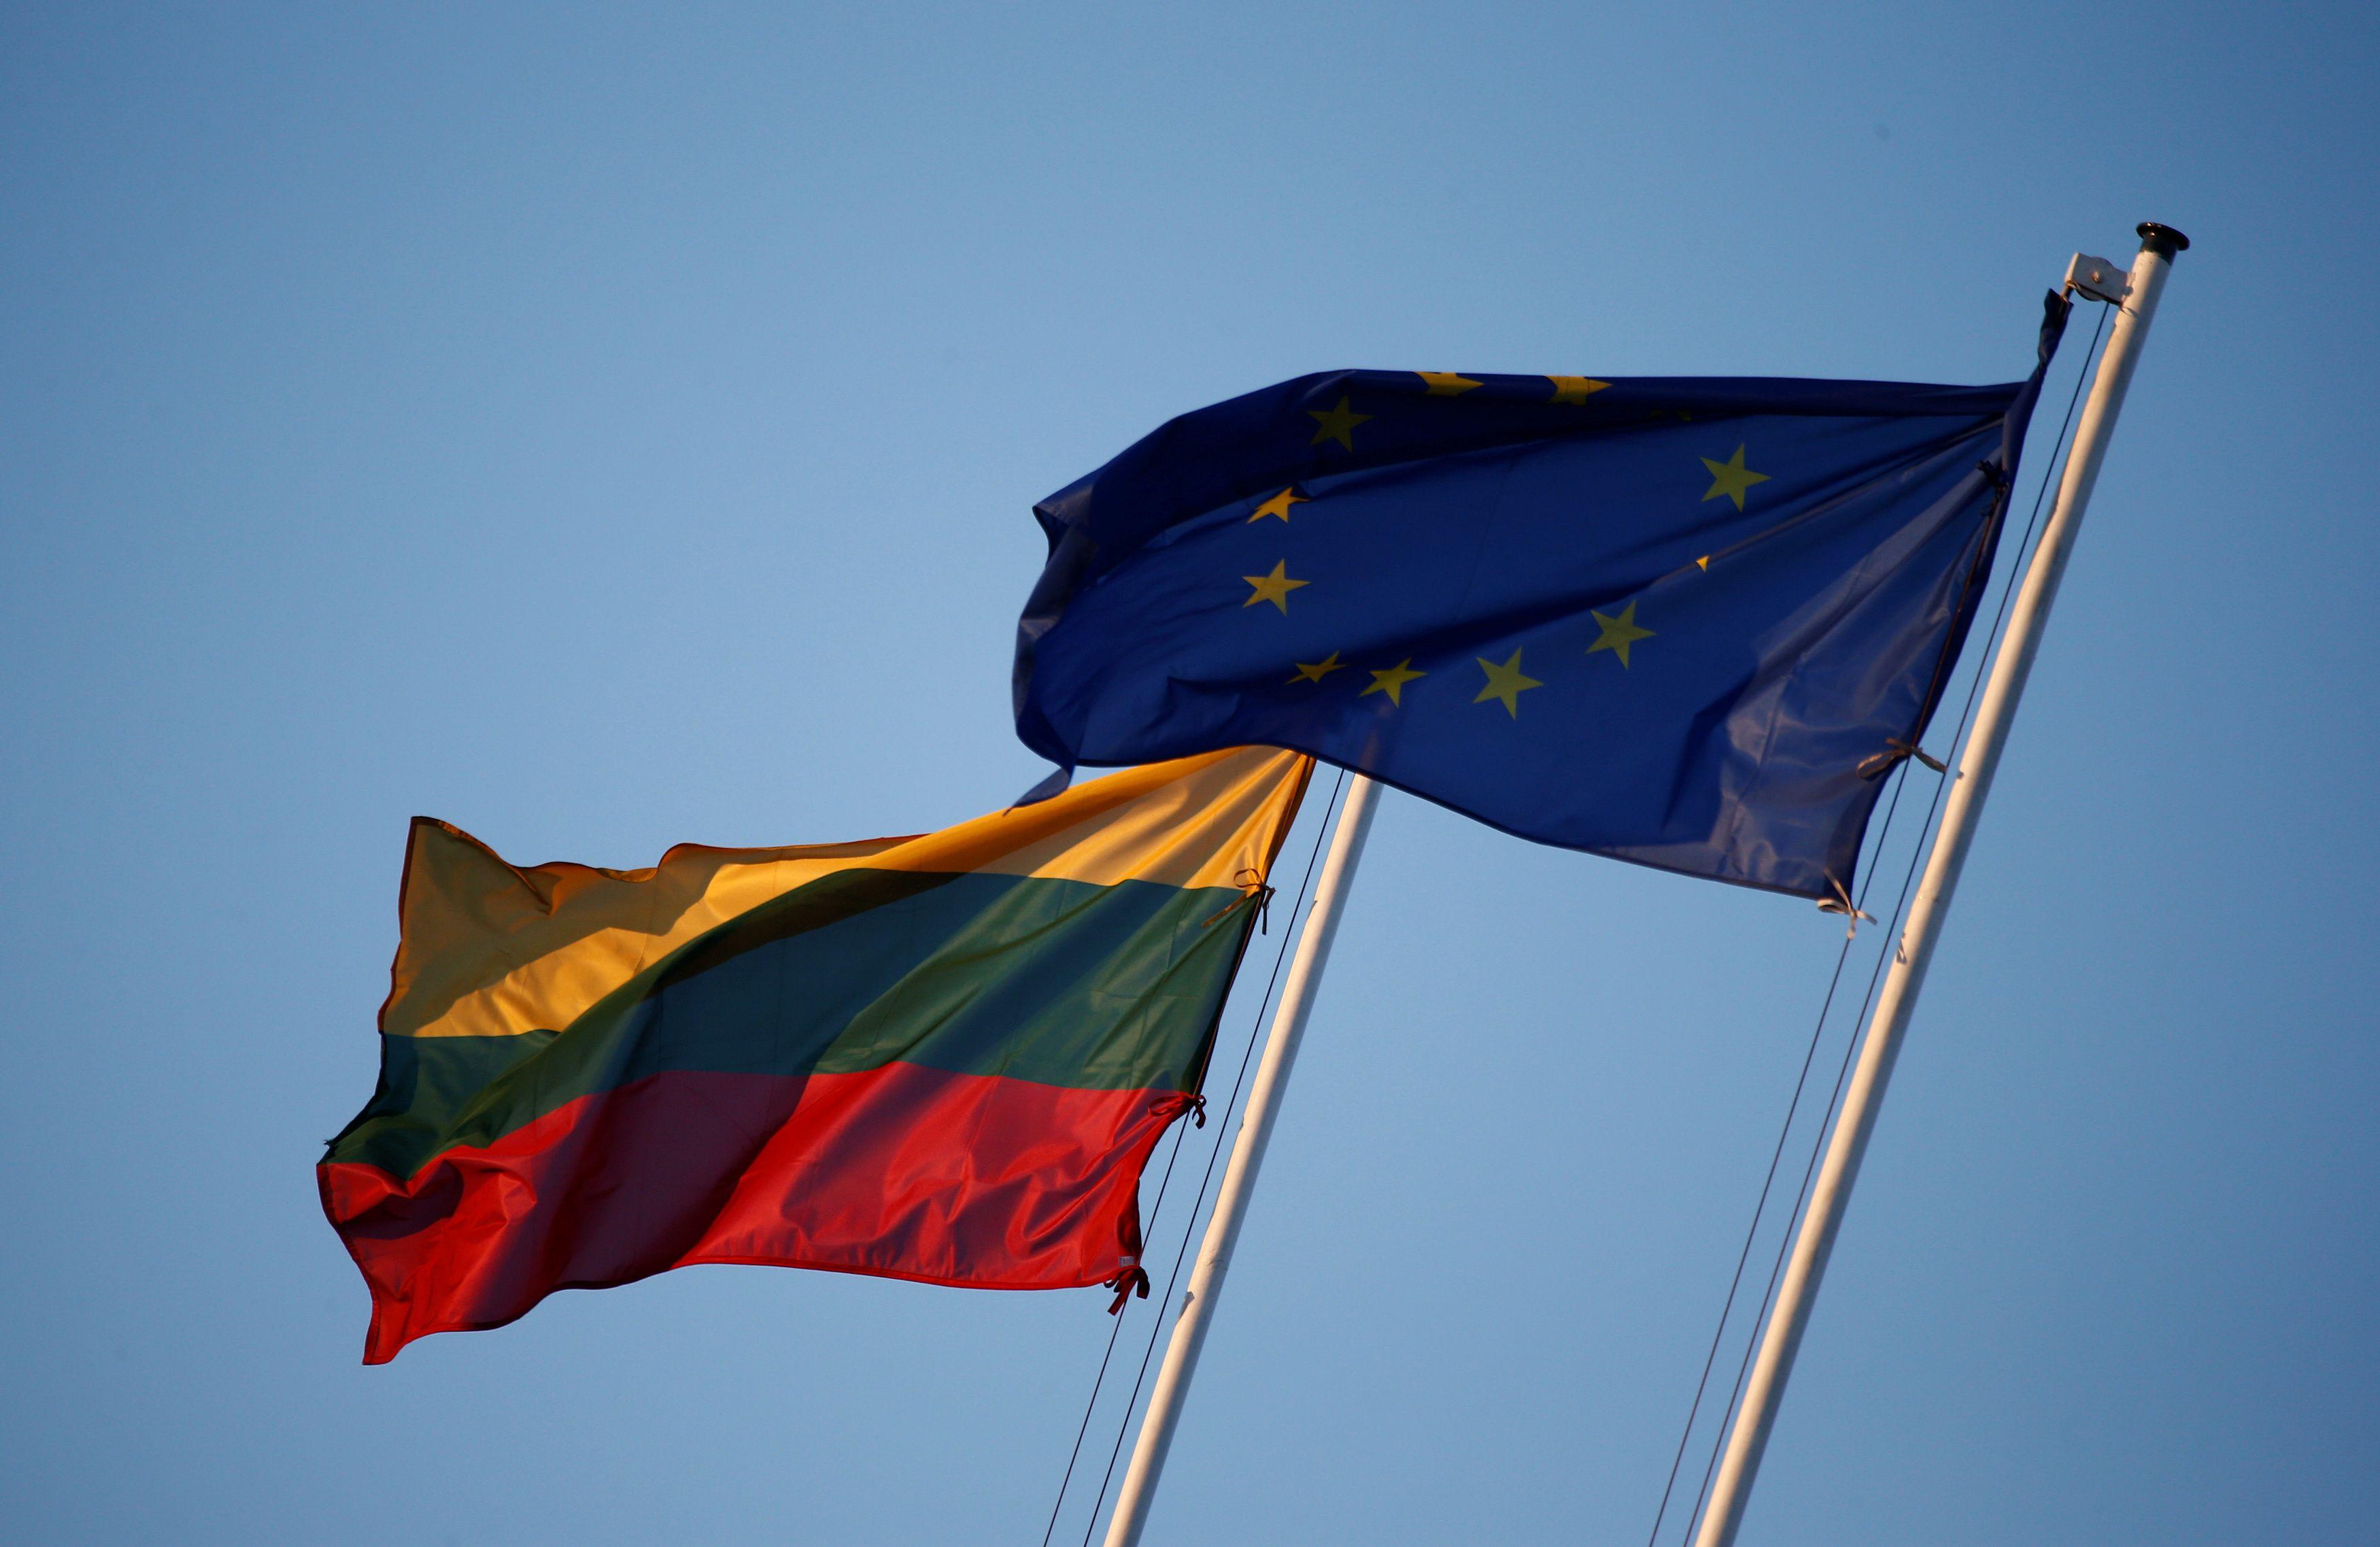 EK: Lietuvos BVP šiemet augs 2,9%, įtampa darbo rinkoje didėja